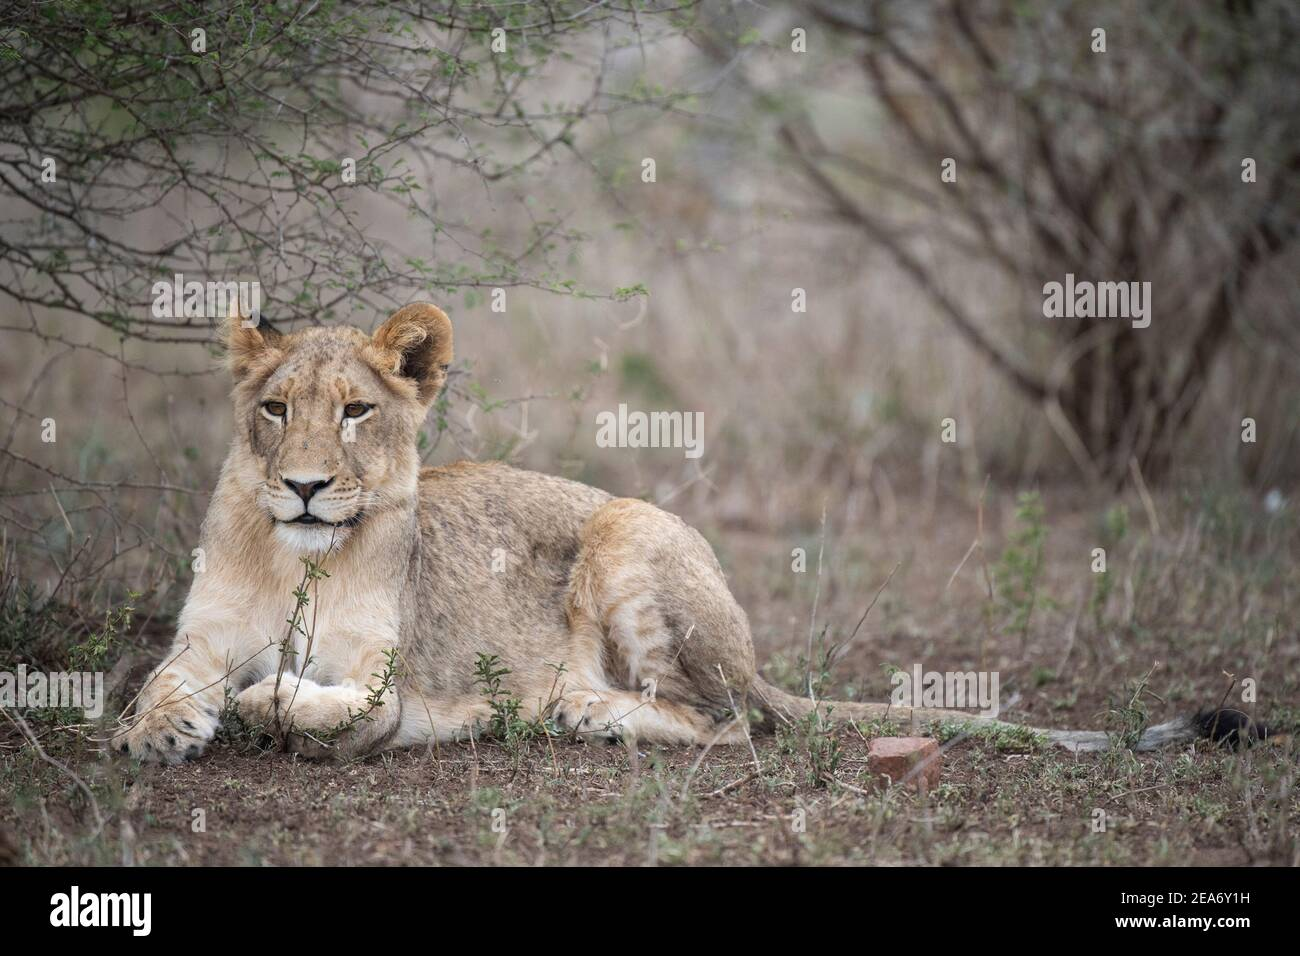 Lion cub, Panthero leo, Kruger National Park, South Africa Stock Photo